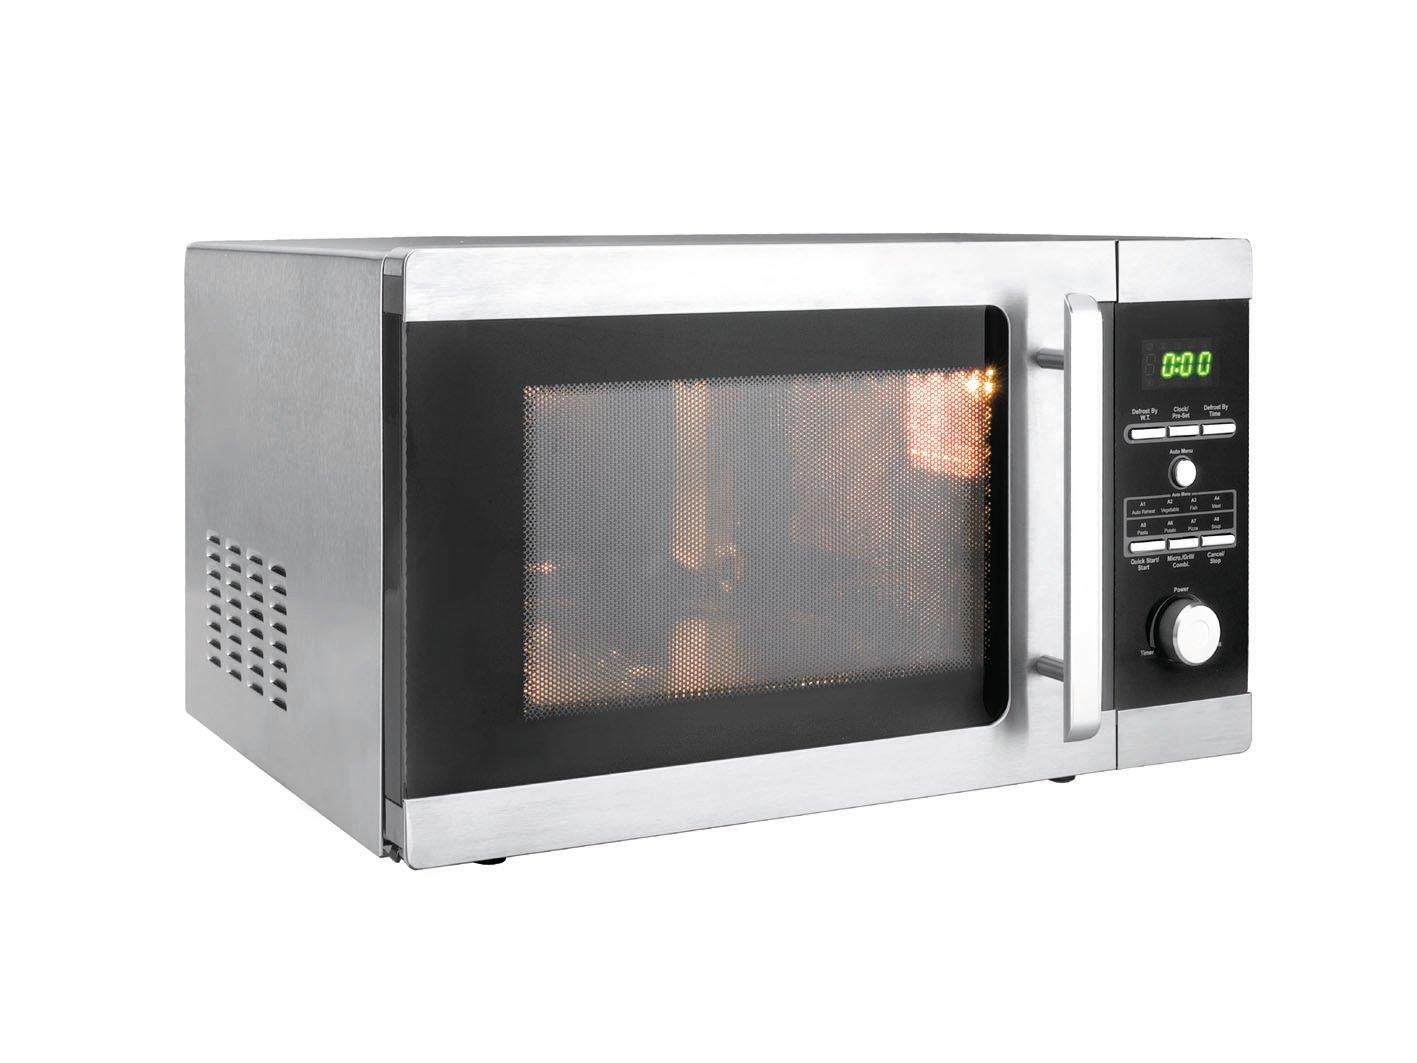 Lacor 69328 - Horno microondas 28lts900w con plato+grill: Amazon.es: Hogar